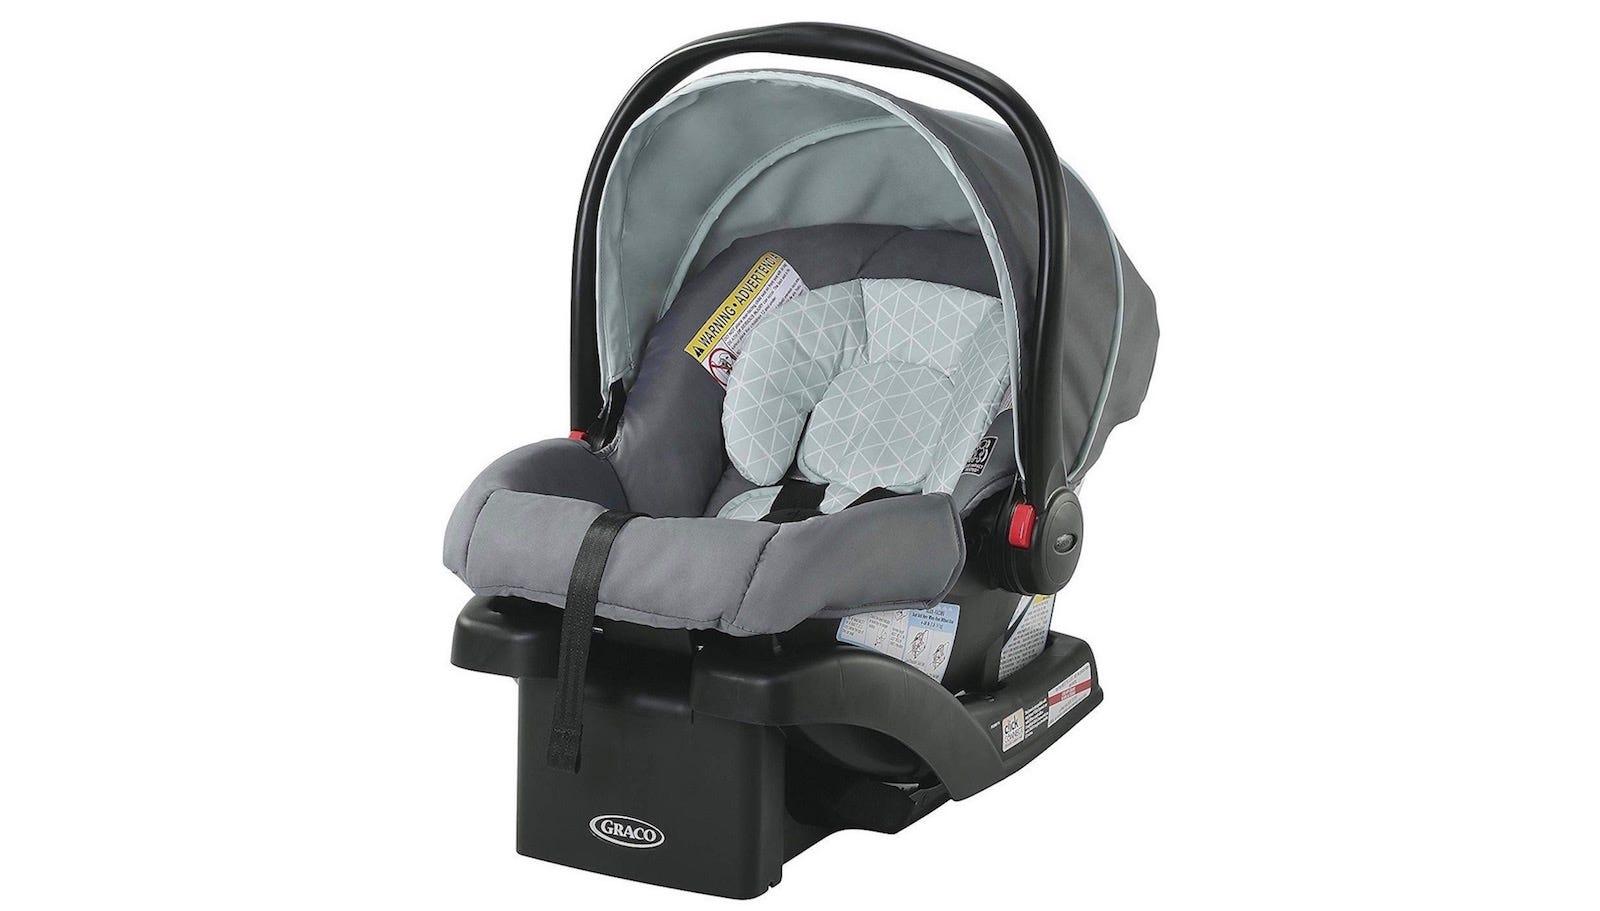 The Graco Snugride Click Connect Car Seat.